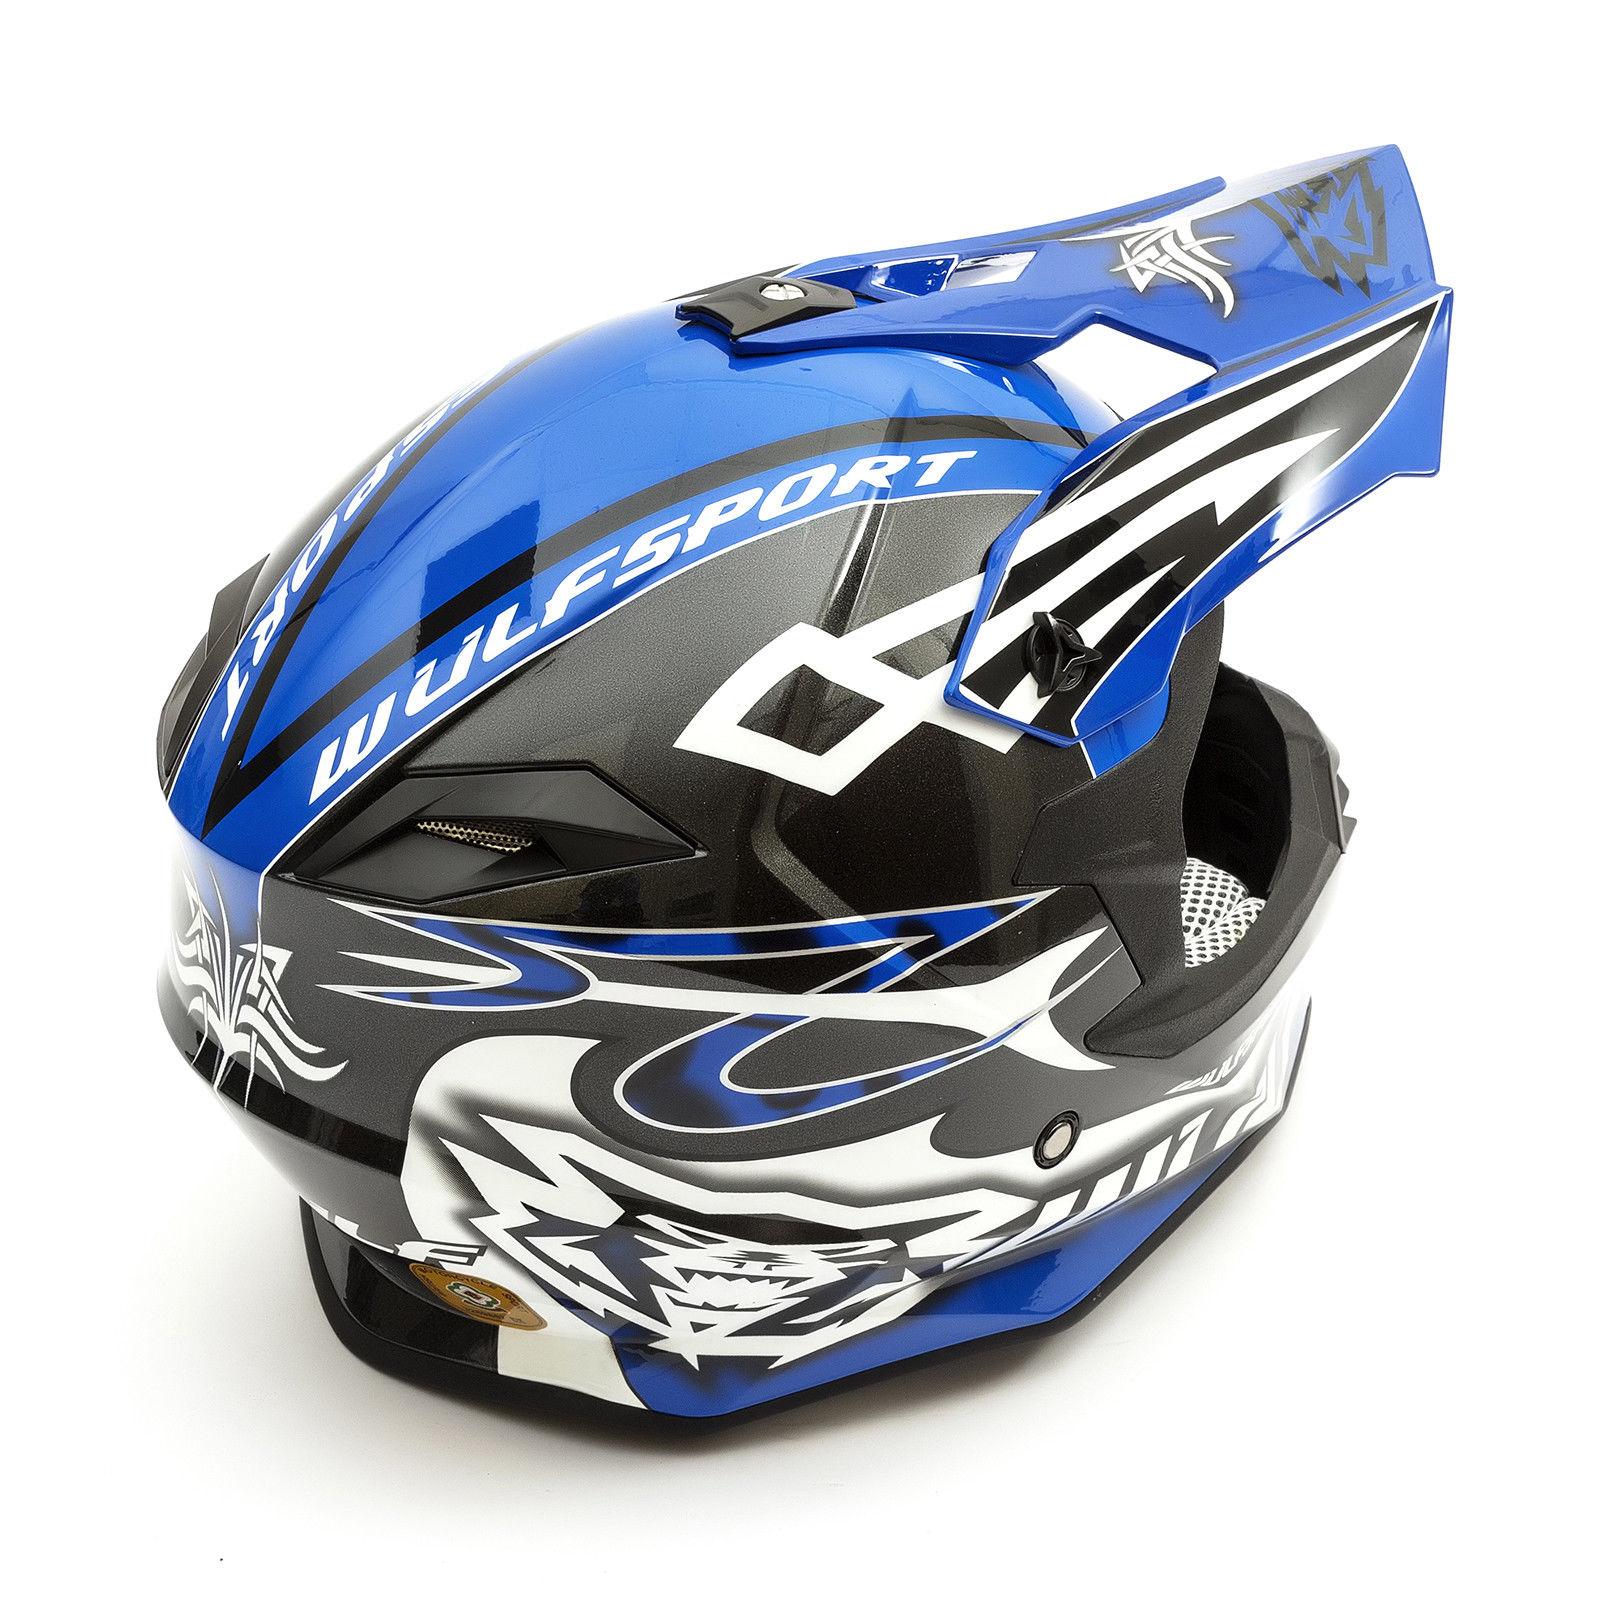 Wulfsport-Adult-Sceptre-Helmets-Motocross-Pitbike-Motorbike-Off-Road-Racing-ATV thumbnail 19